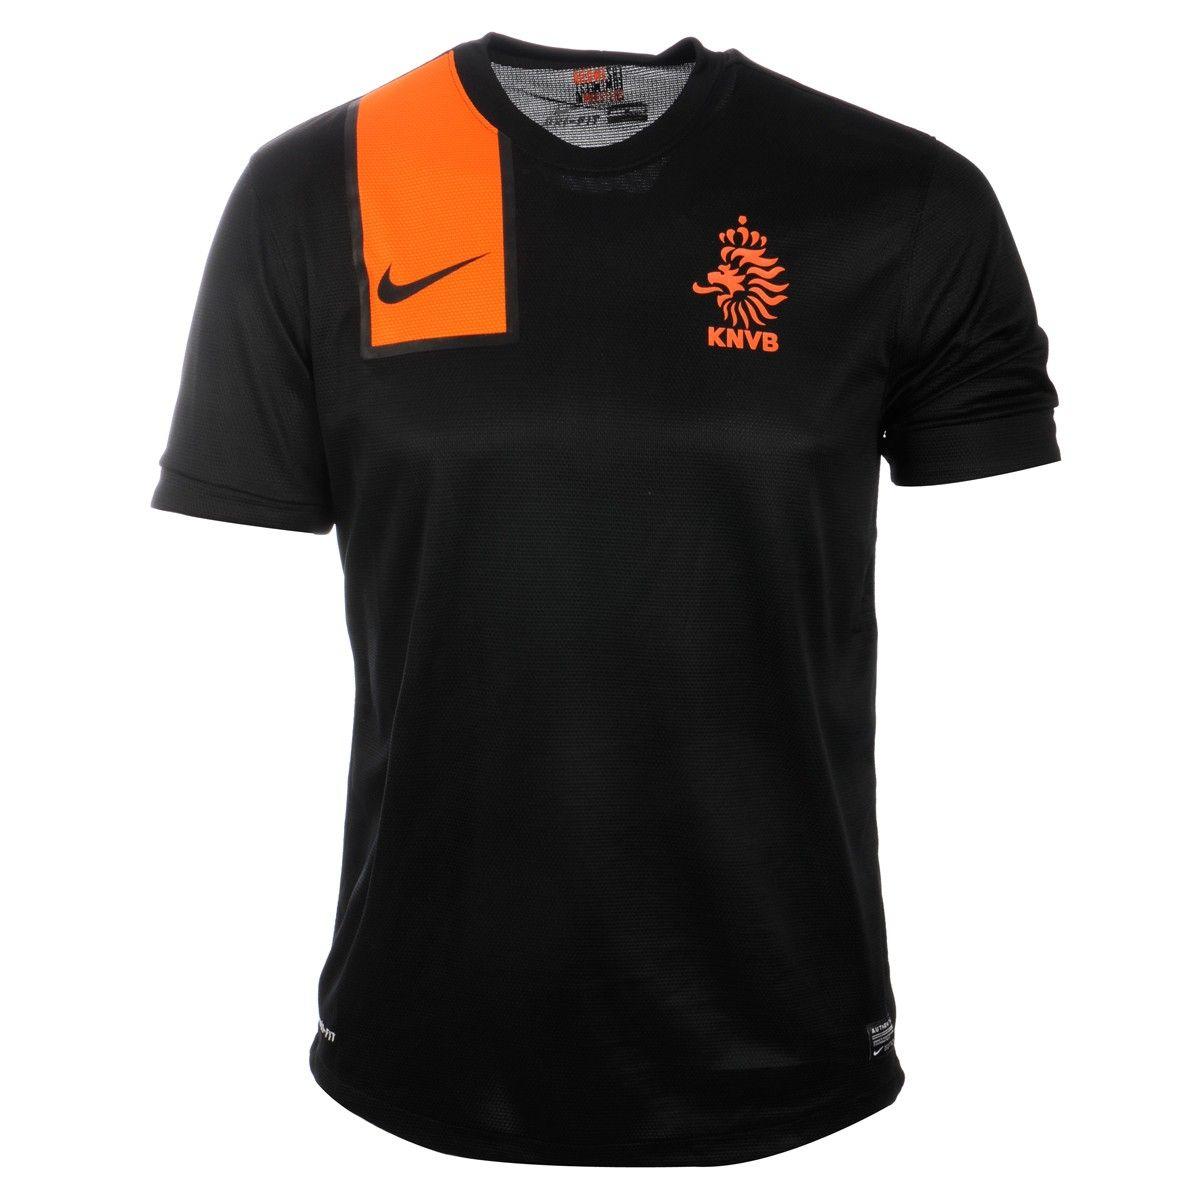 quality design b6441 d44f0 Holanda Uniforme 2 2012 - Paesi Bassi - Netherlands - holland, - futebol,  football, soccer, voetbal, calcio